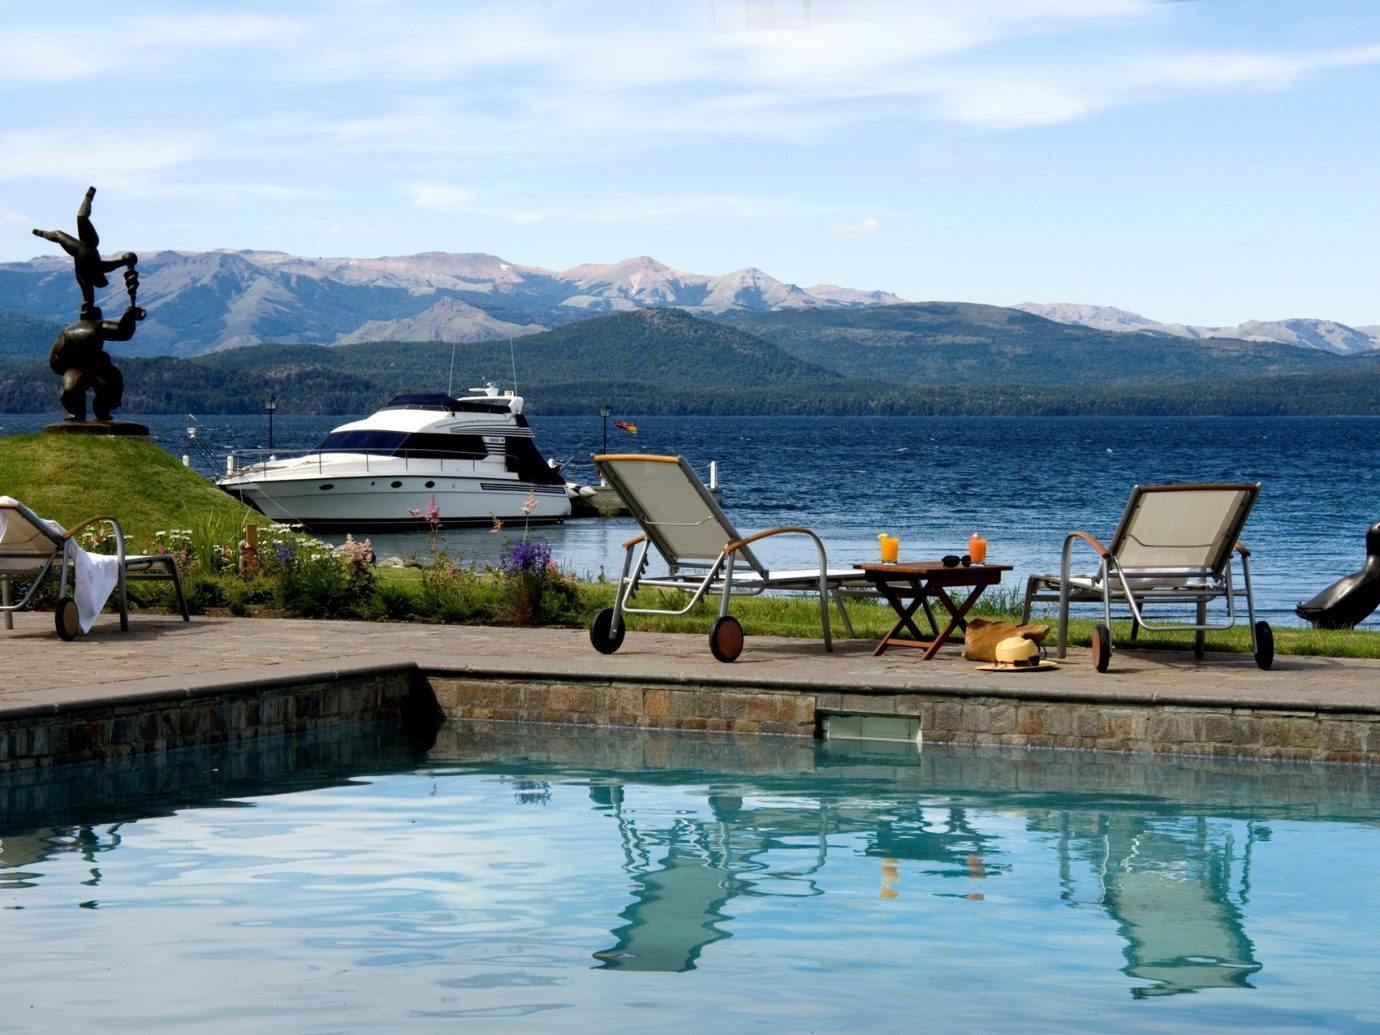 Hotels water sky mountain outdoor Lake Sea shore vacation vehicle dock Ocean bay Coast reflection marina overlooking